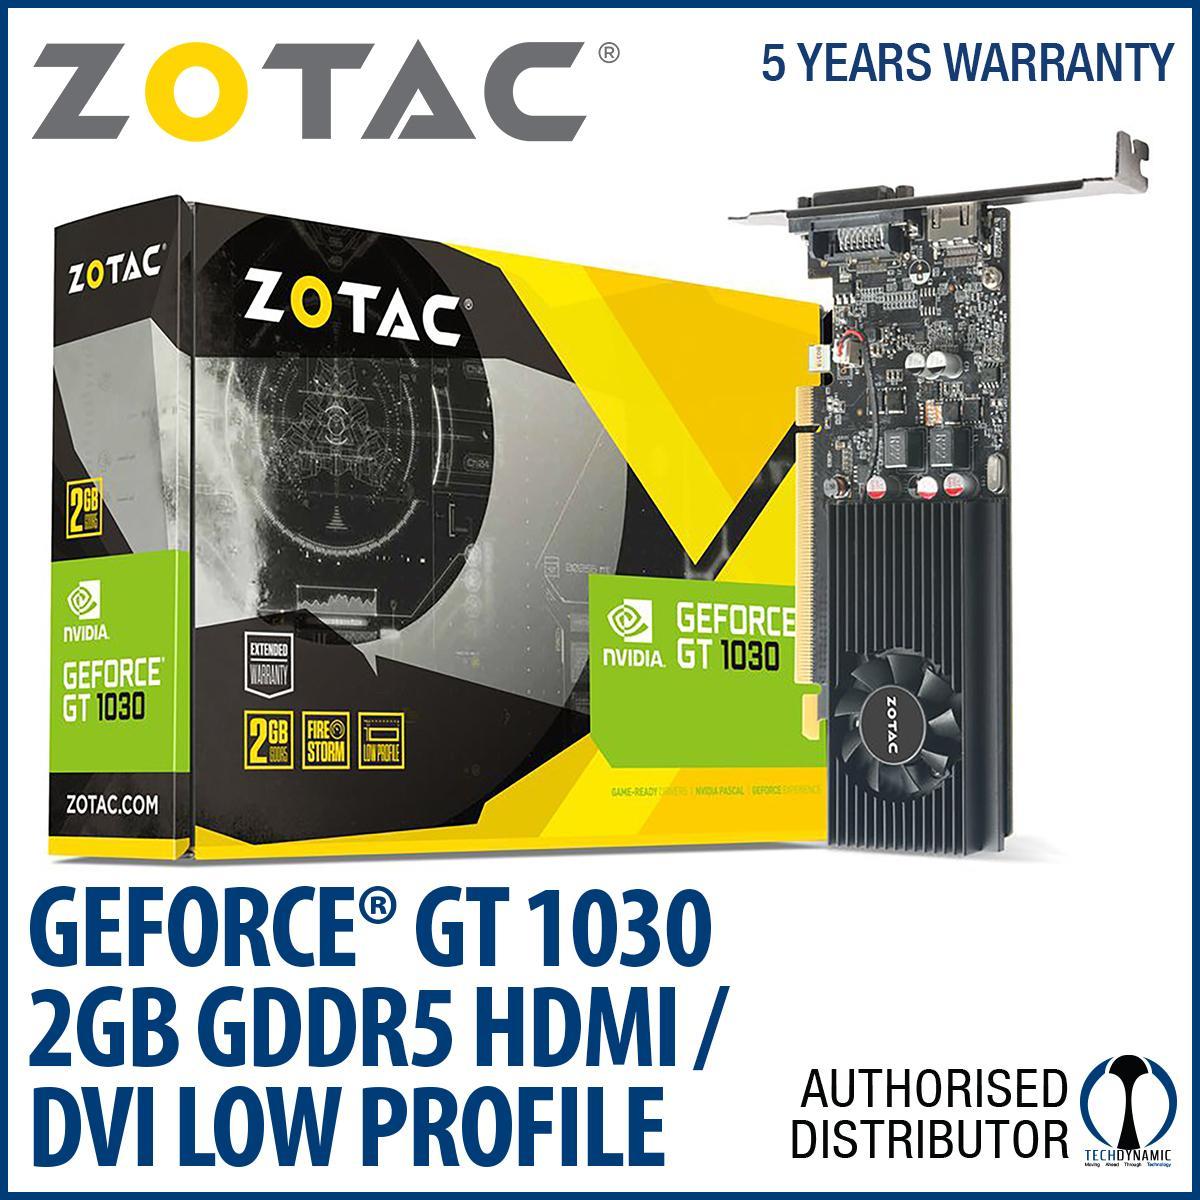 Buy Cheap Zotac Geforce® Gt 1030 2Gb Gddr5